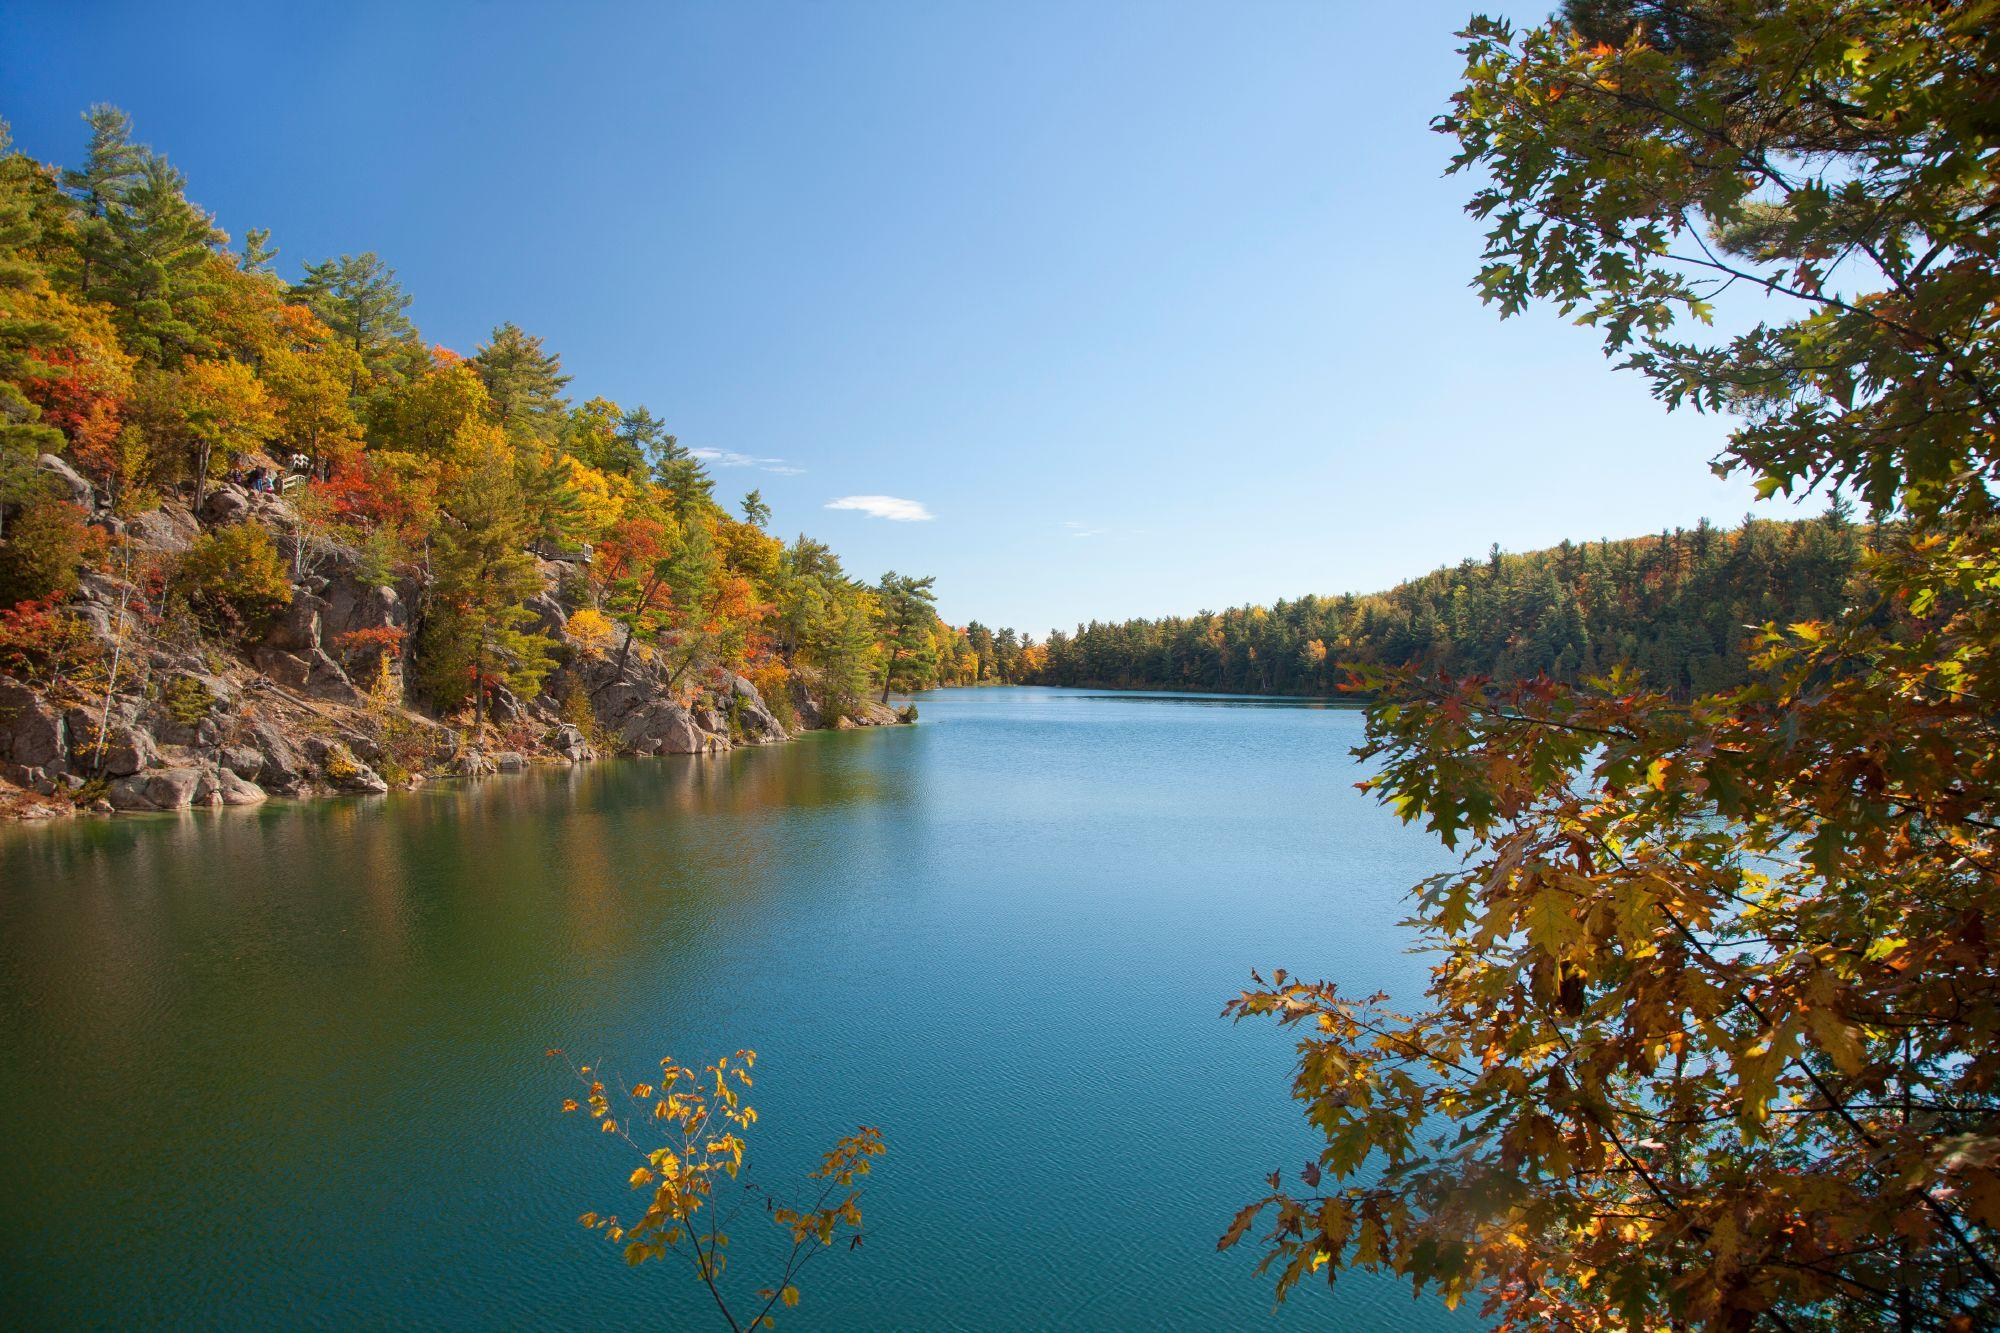 Meech Lake